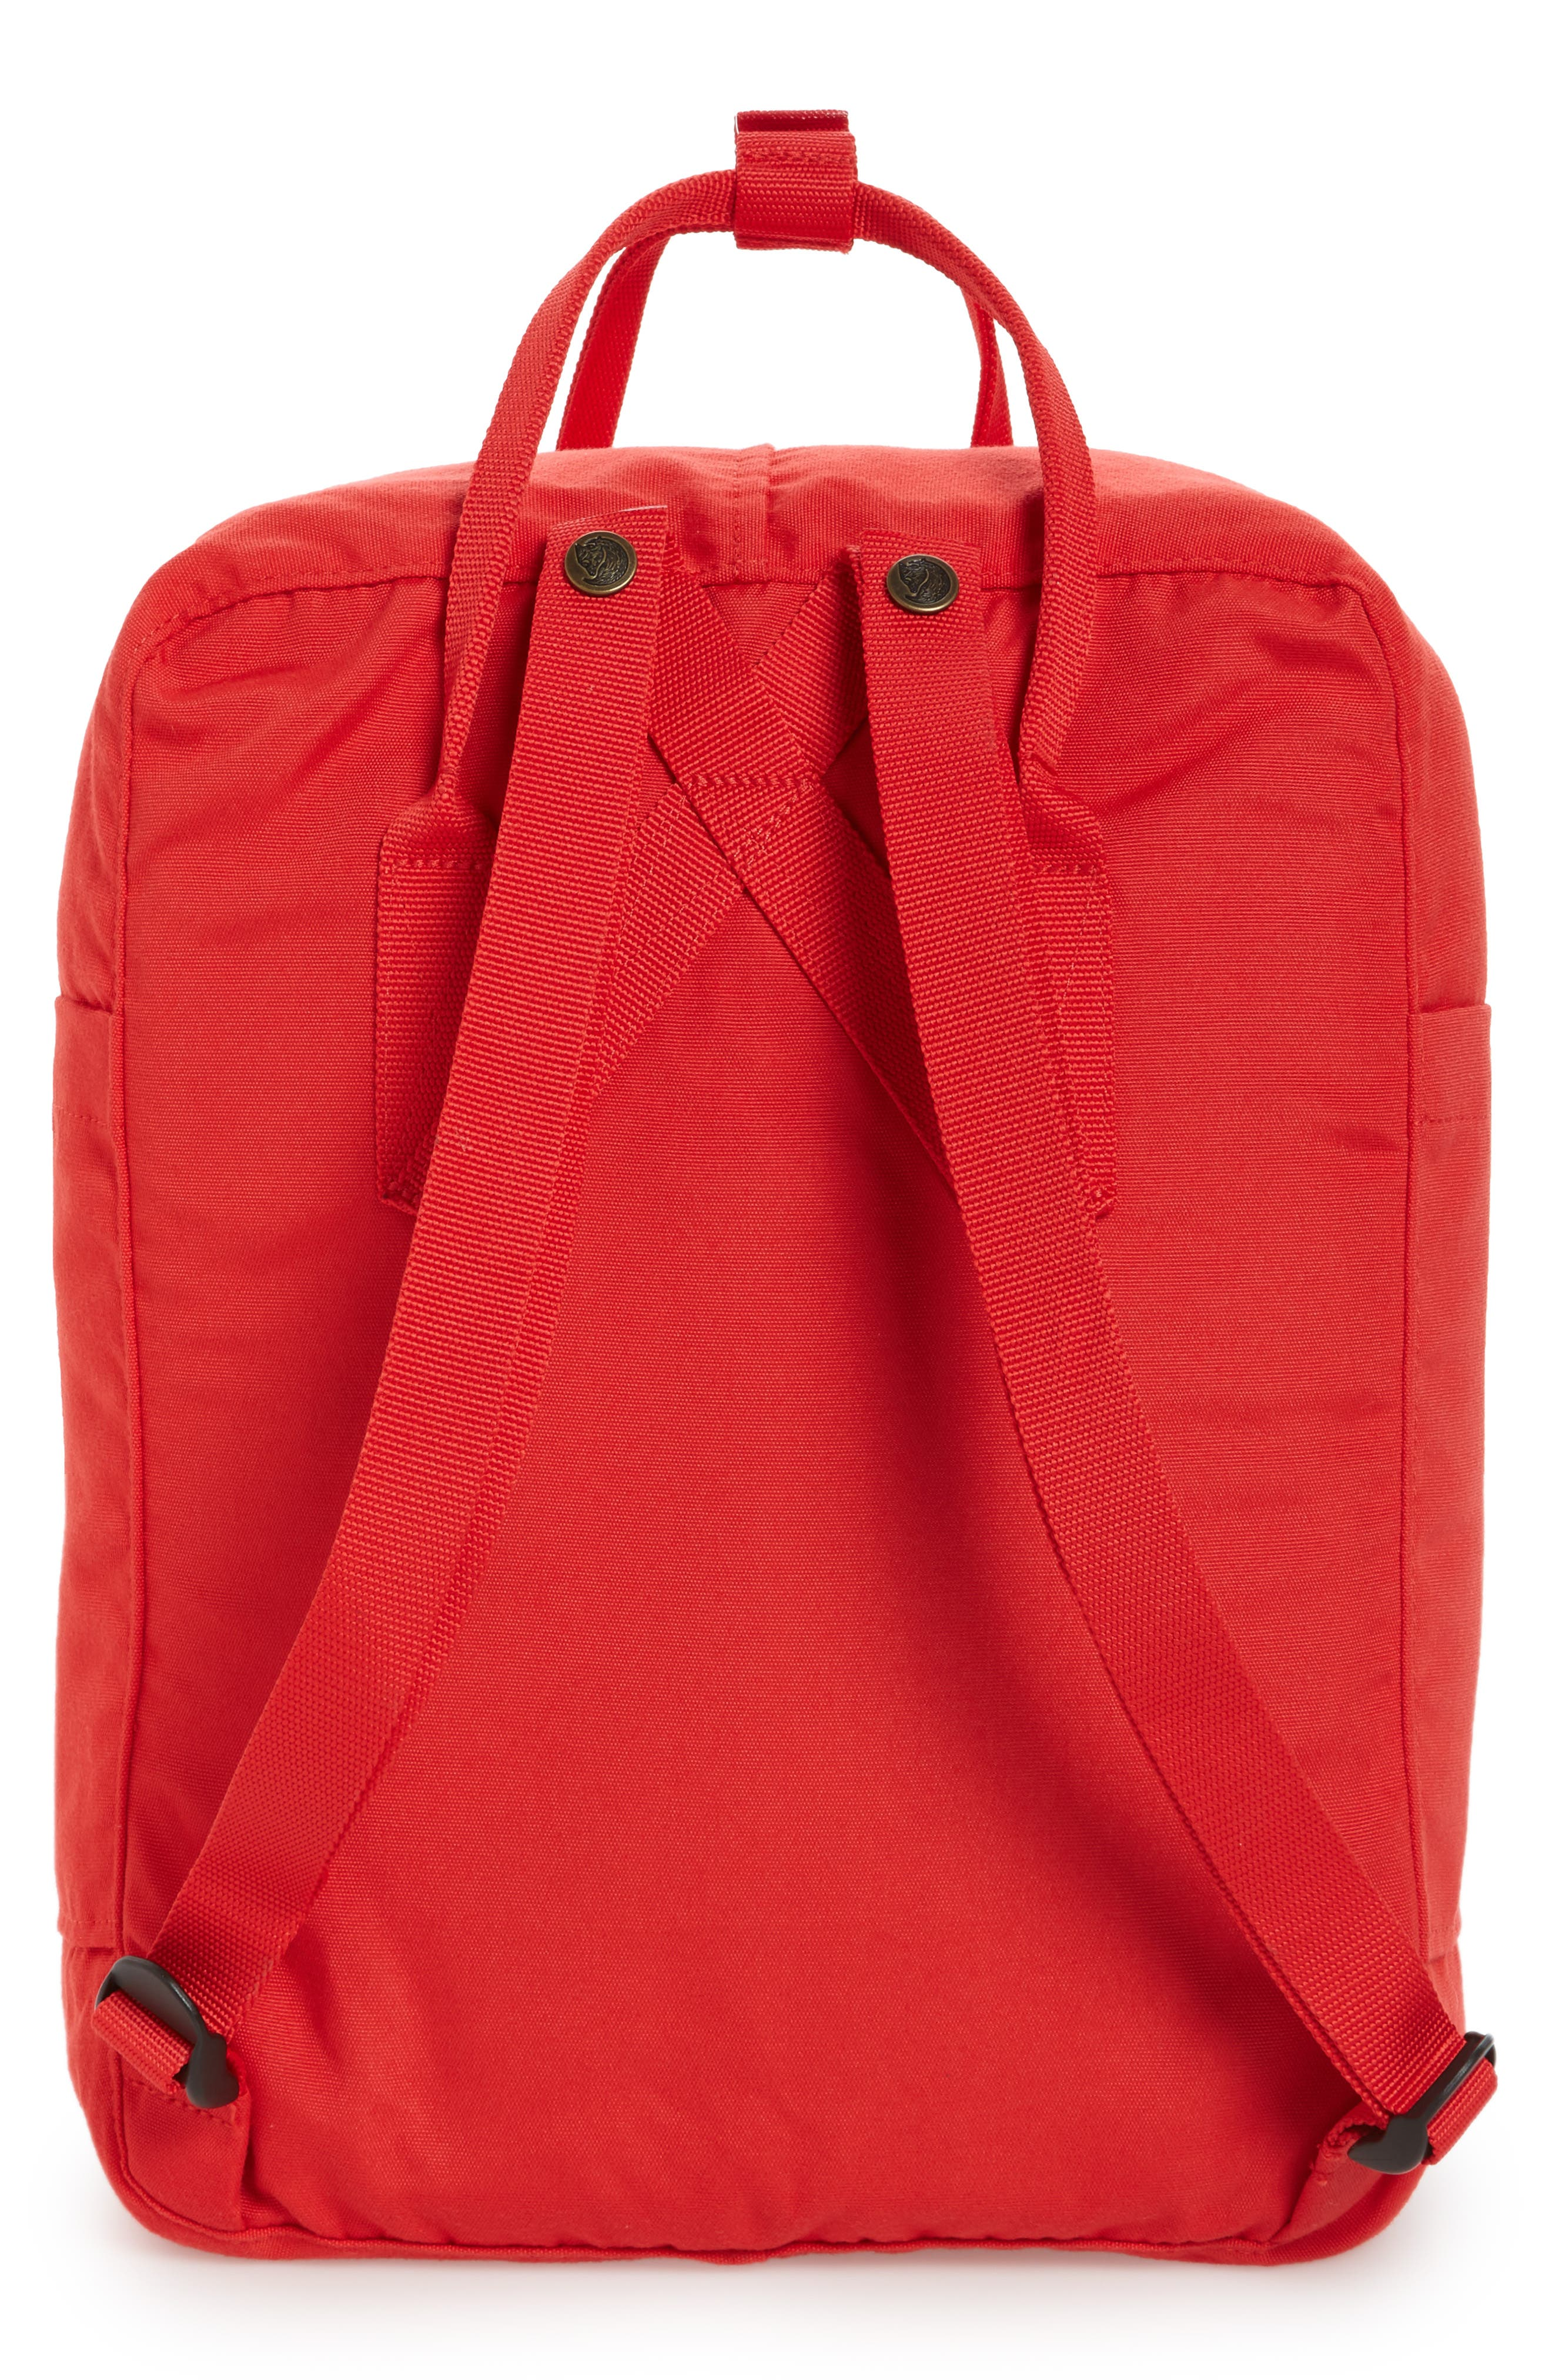 Re-Kånken Water Resistant Backpack,                             Alternate thumbnail 3, color,                             Red